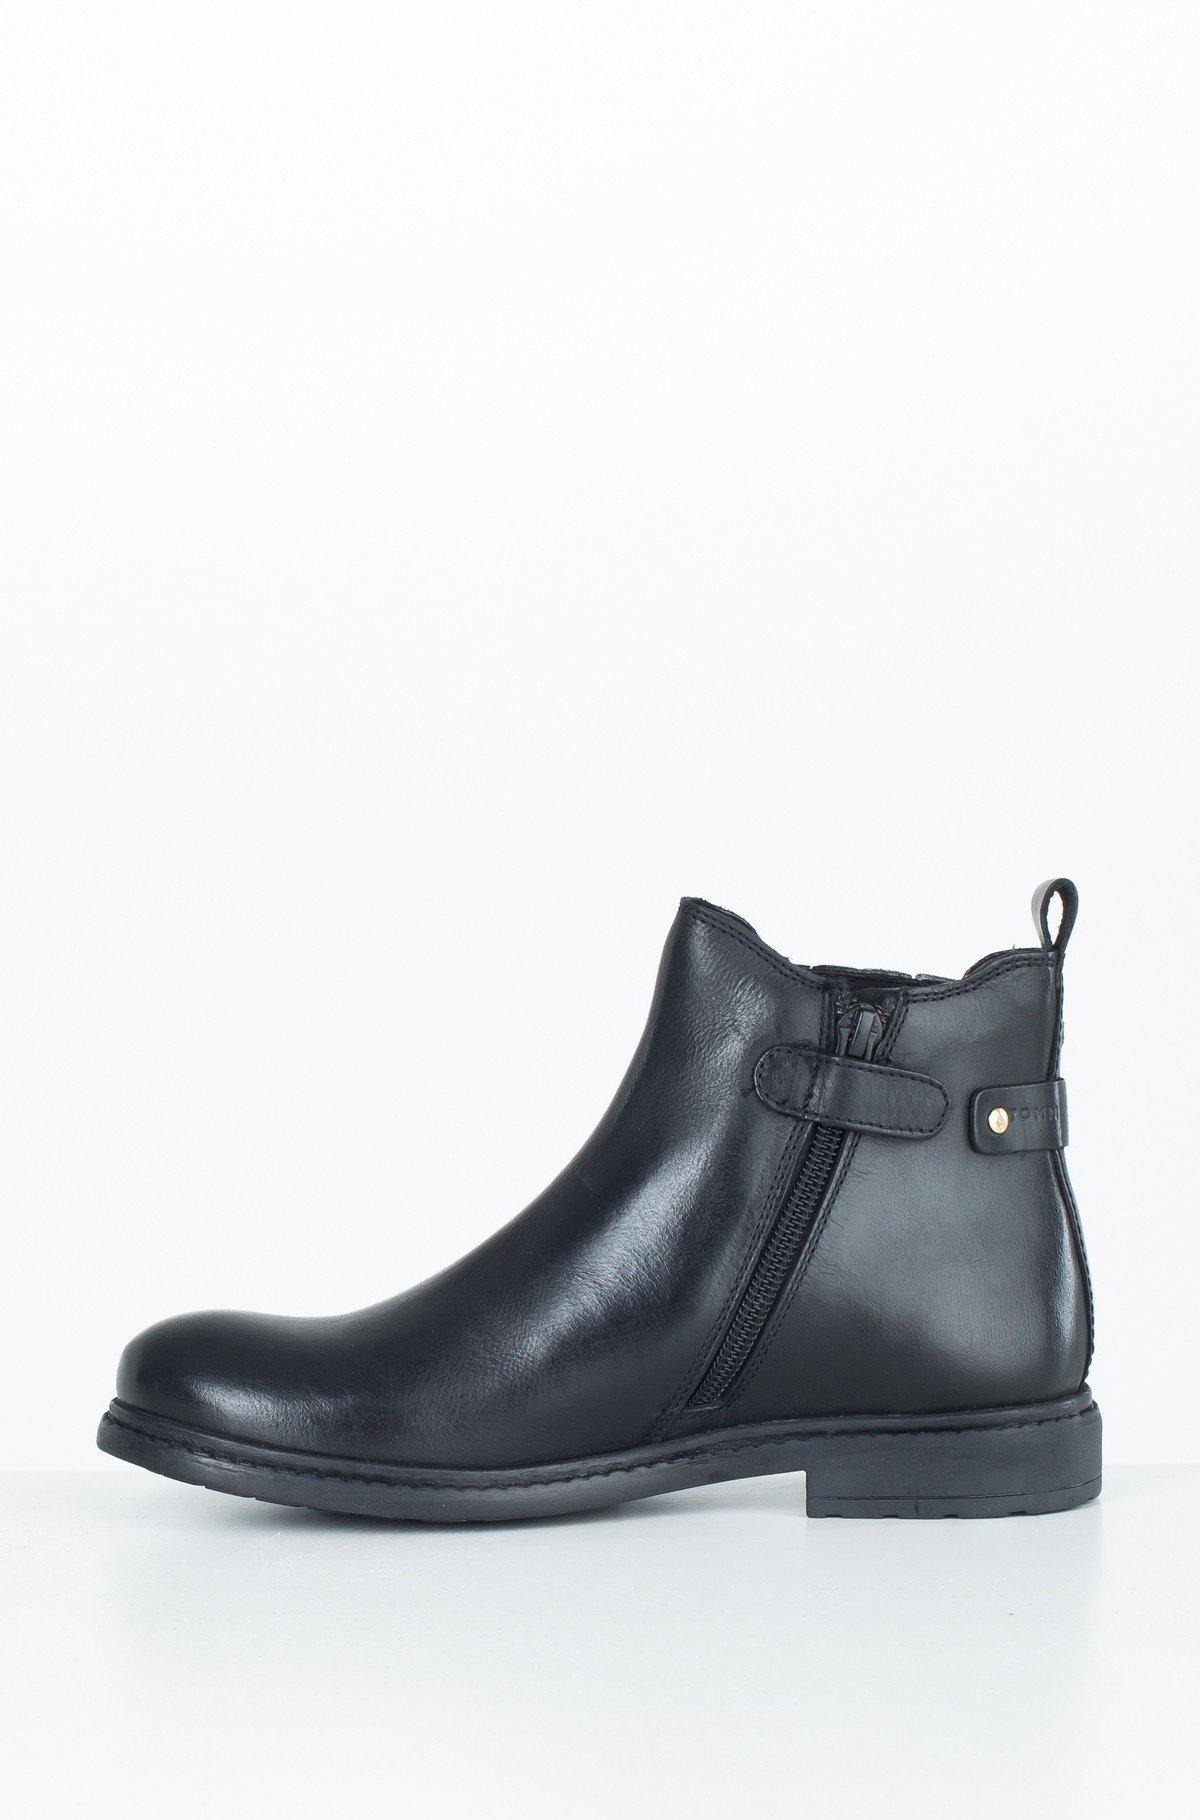 Vaikiški batai T4A5-30053-0283999-full-2